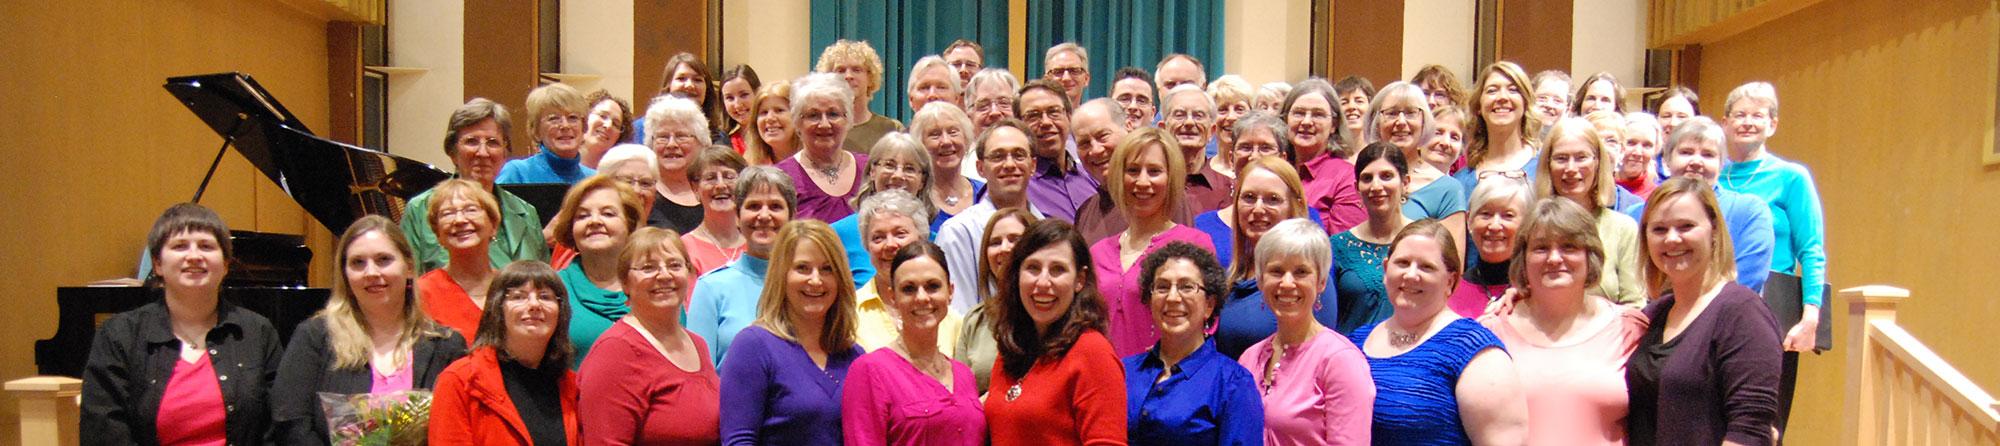 Guelph Community Singers